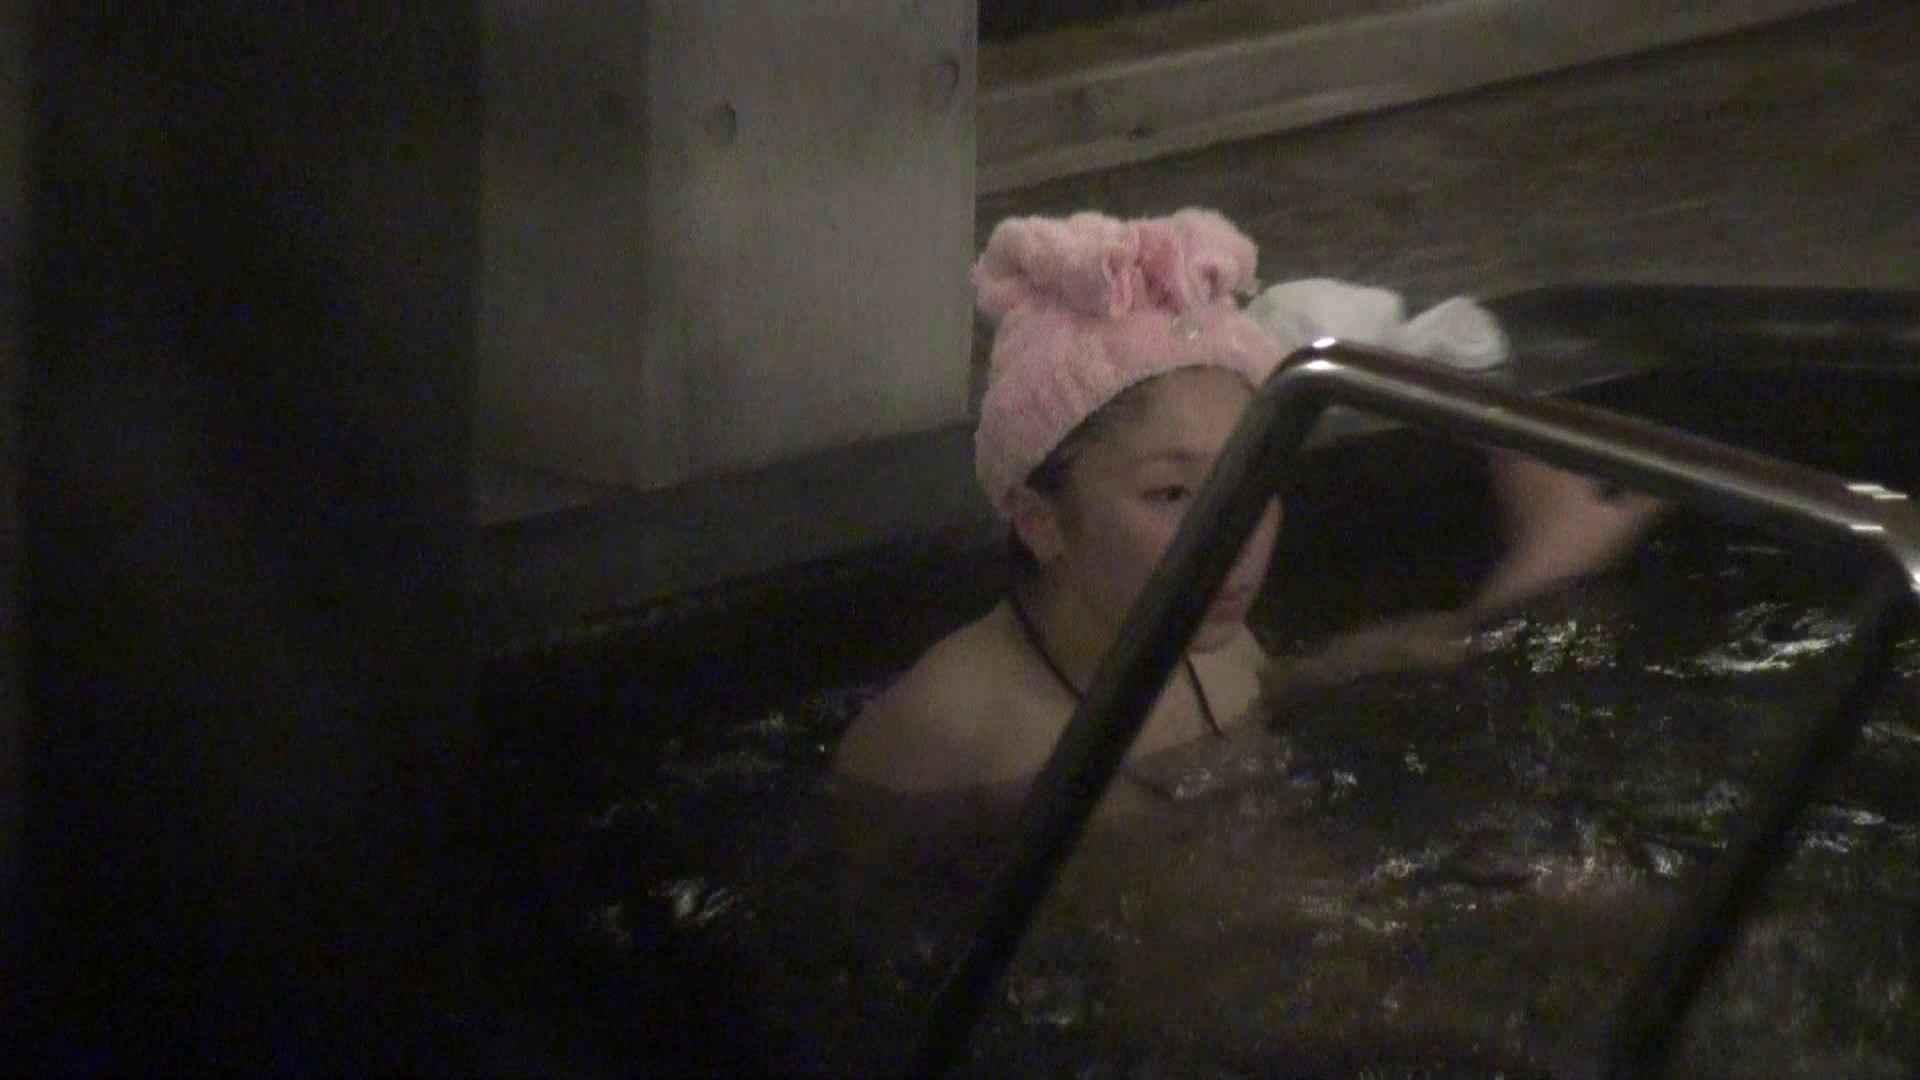 Aquaな露天風呂Vol.347 OLセックス | 露天  69画像 25